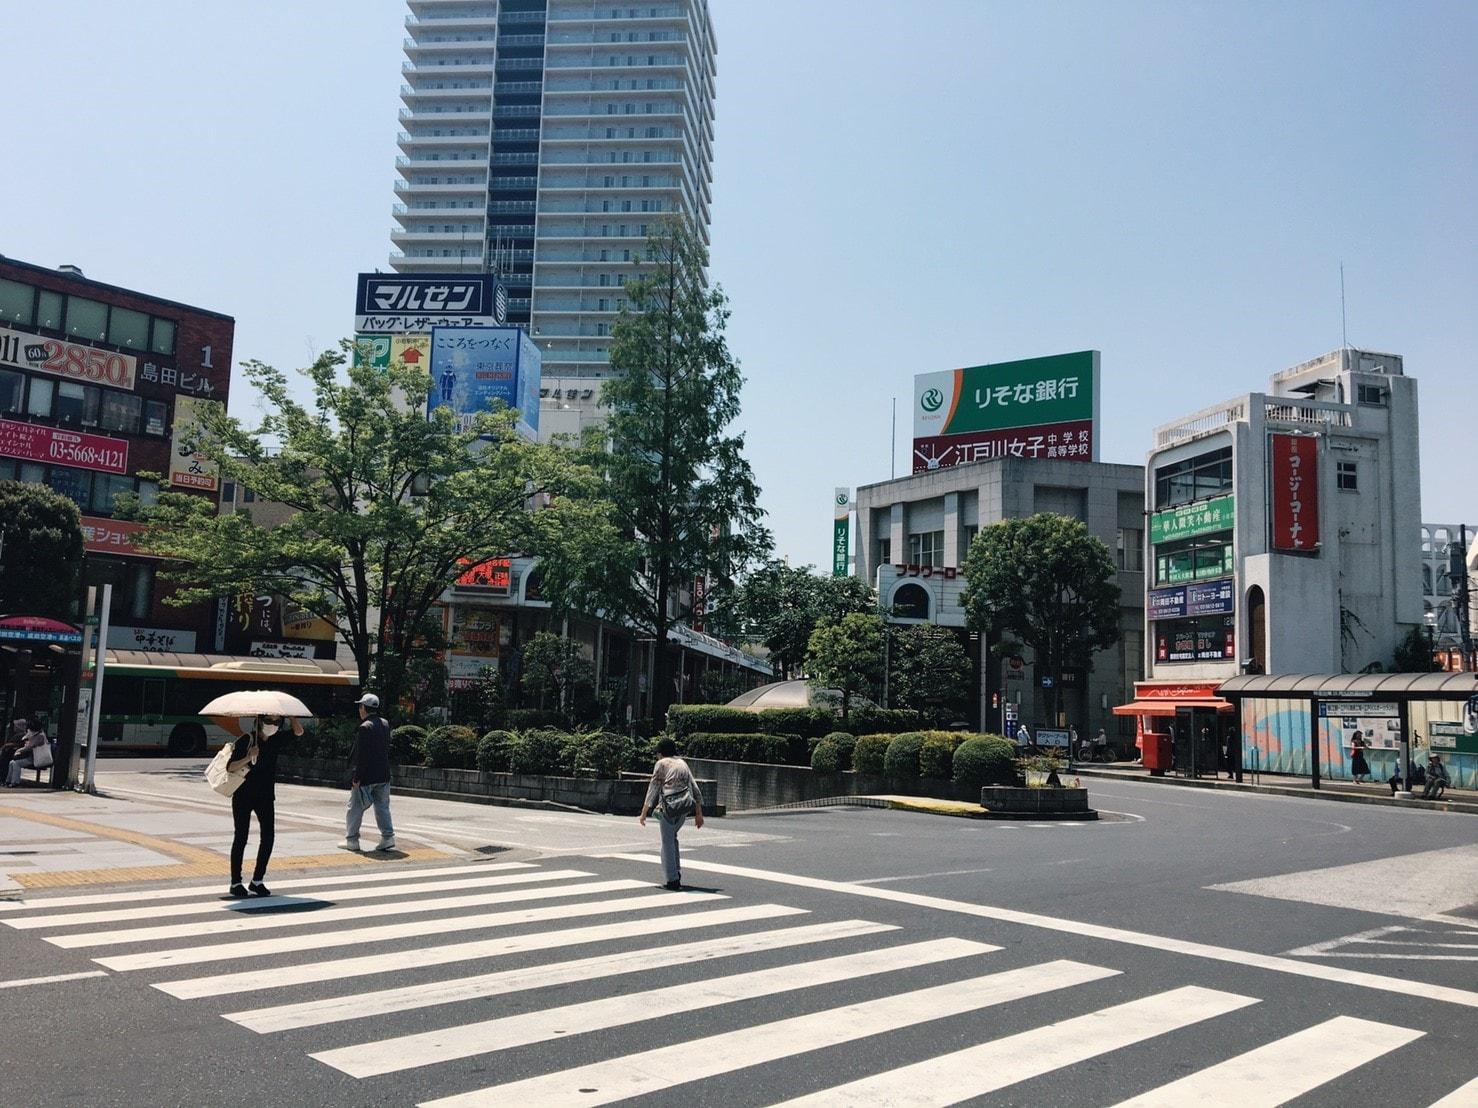 小岩駅前の風景